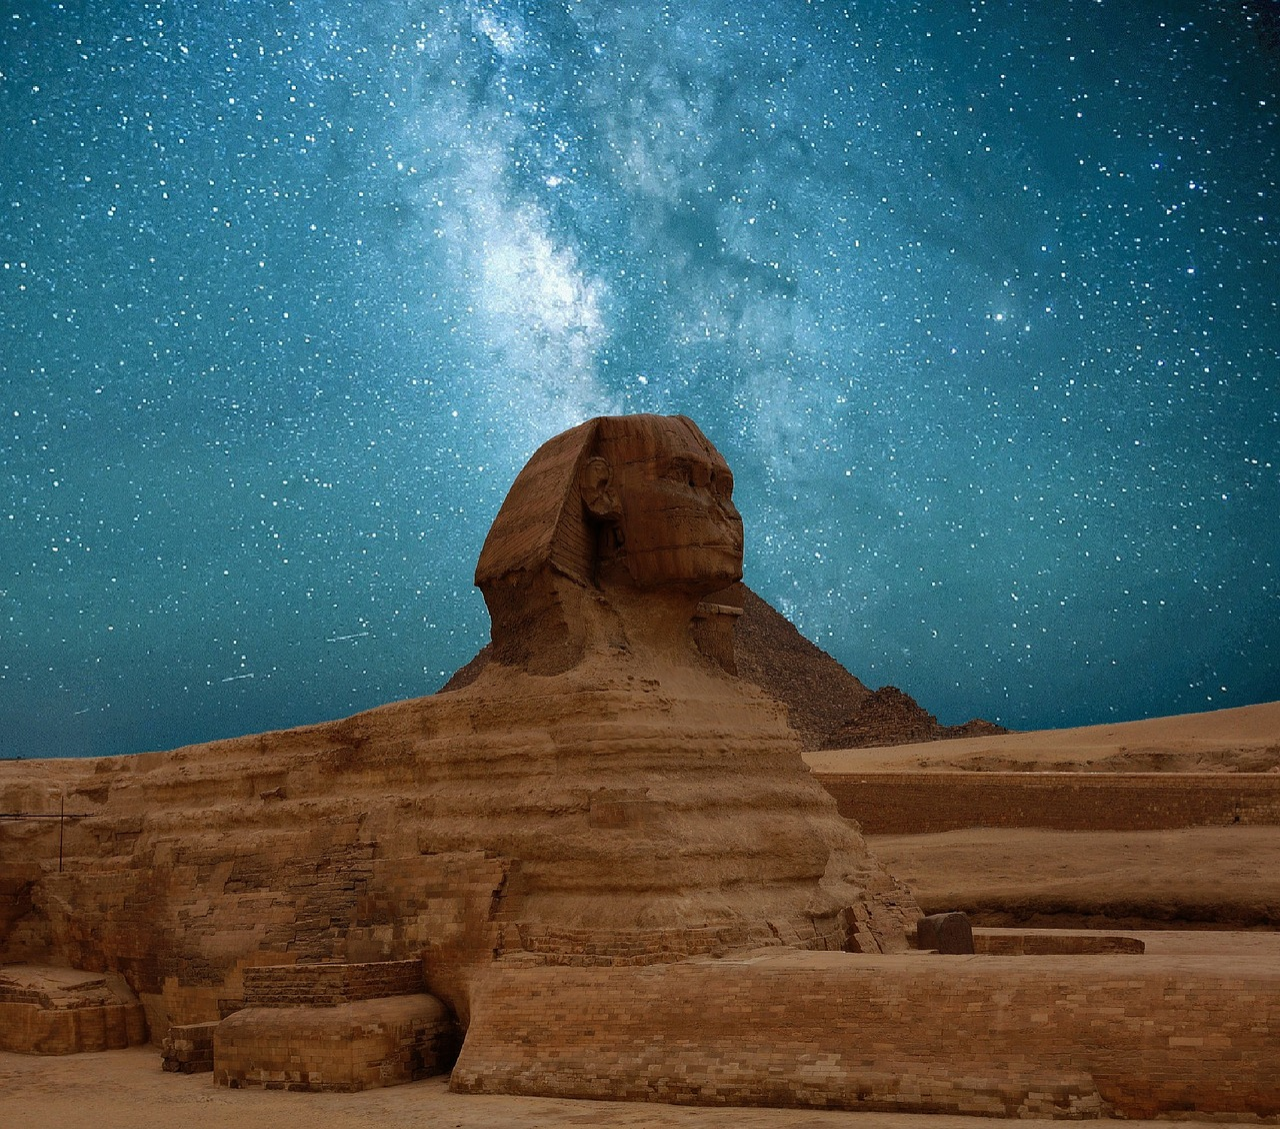 Марта, картинки сфинкса в египте